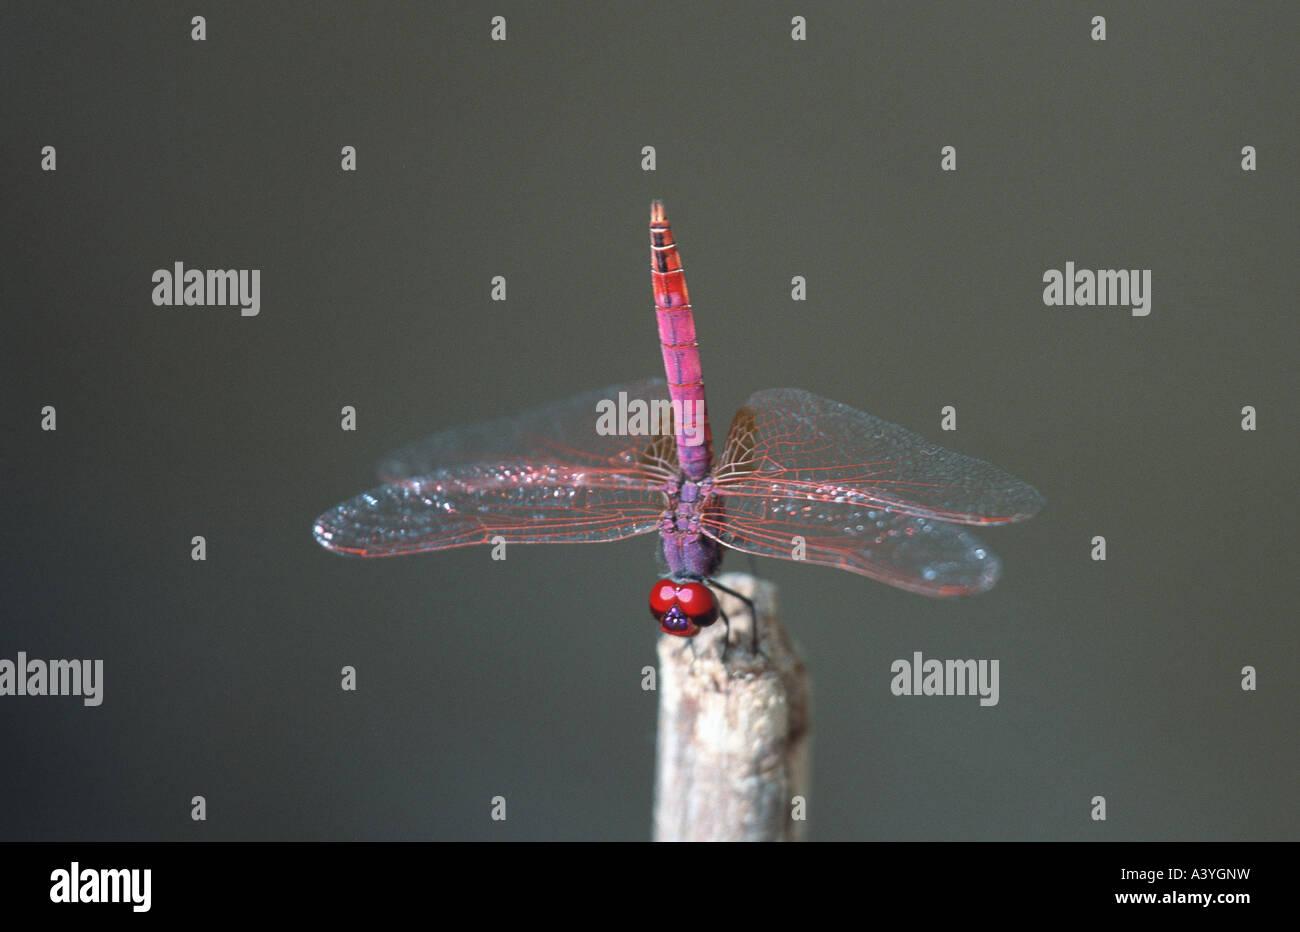 scarlet darter (Crocothemis erythraea), with upright abdomen against overheating, Senegal, Djoudj NP Stock Photo